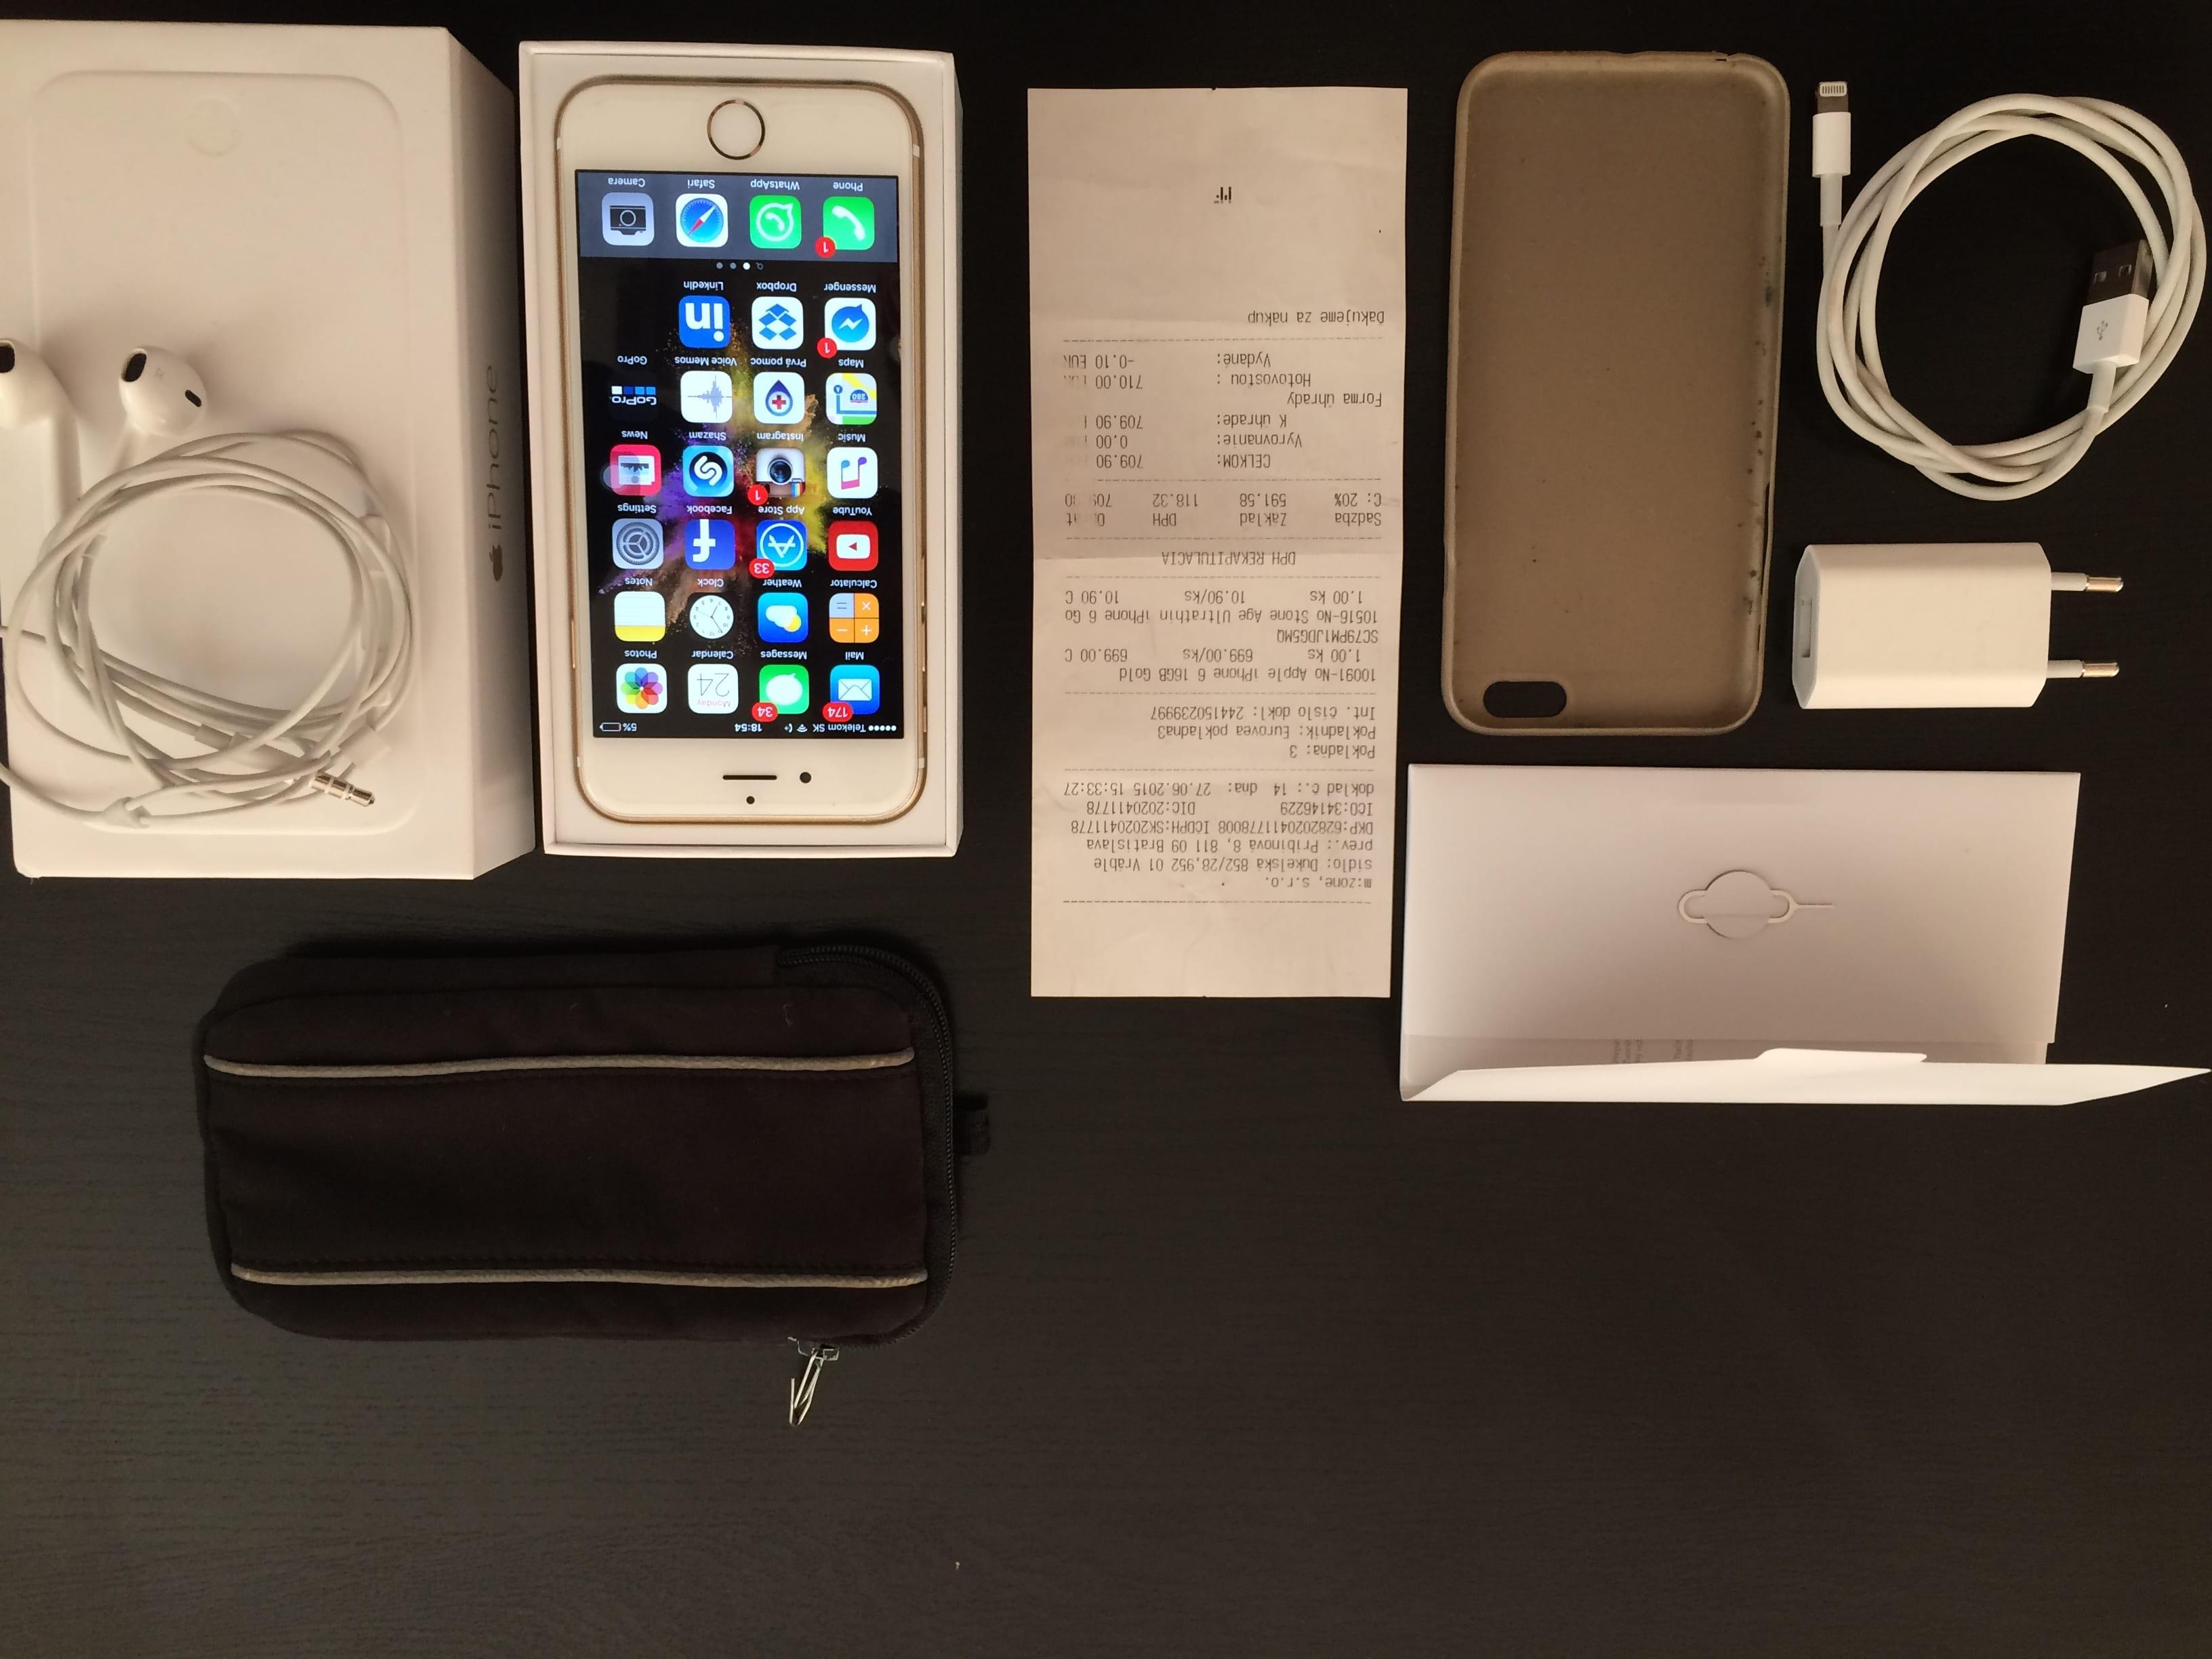 Zobraziť inzerát ~ MacBlog.sk - iPhone - P  Iphone 6 16 GB f2f05bc6c75